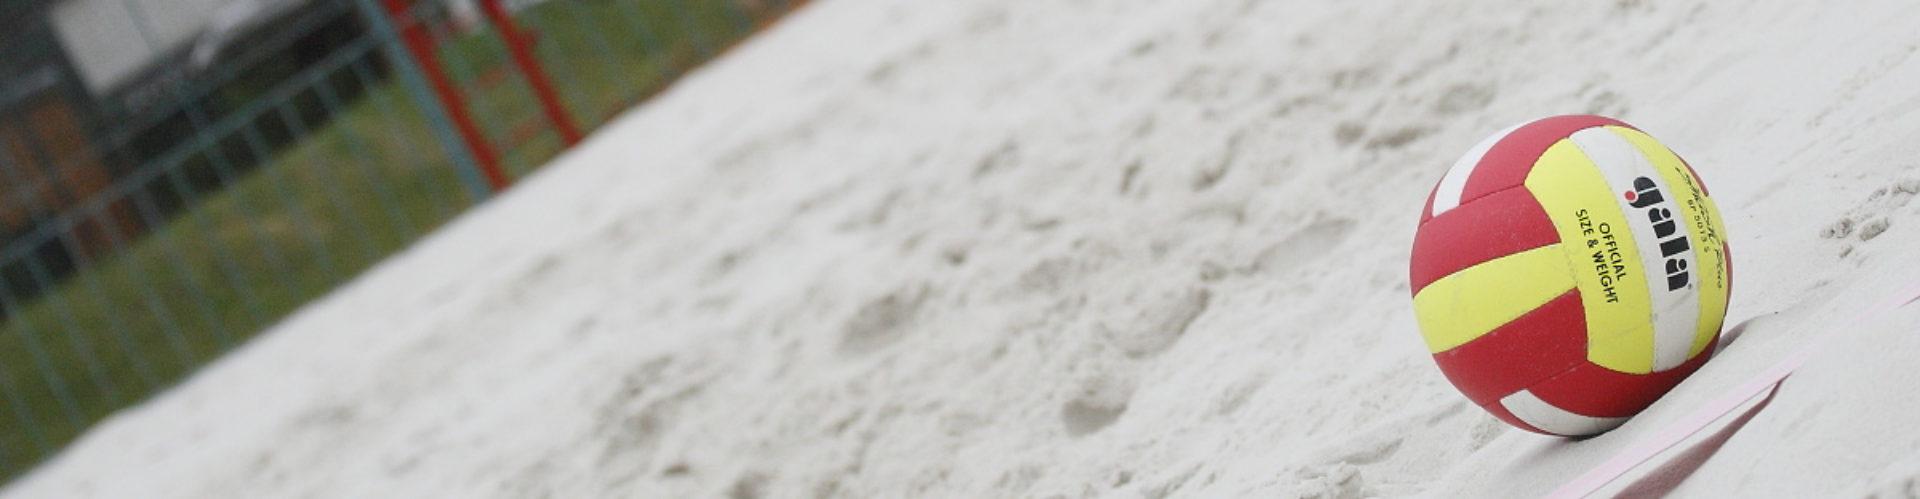 SBL |Stříbrské Beachové Léto